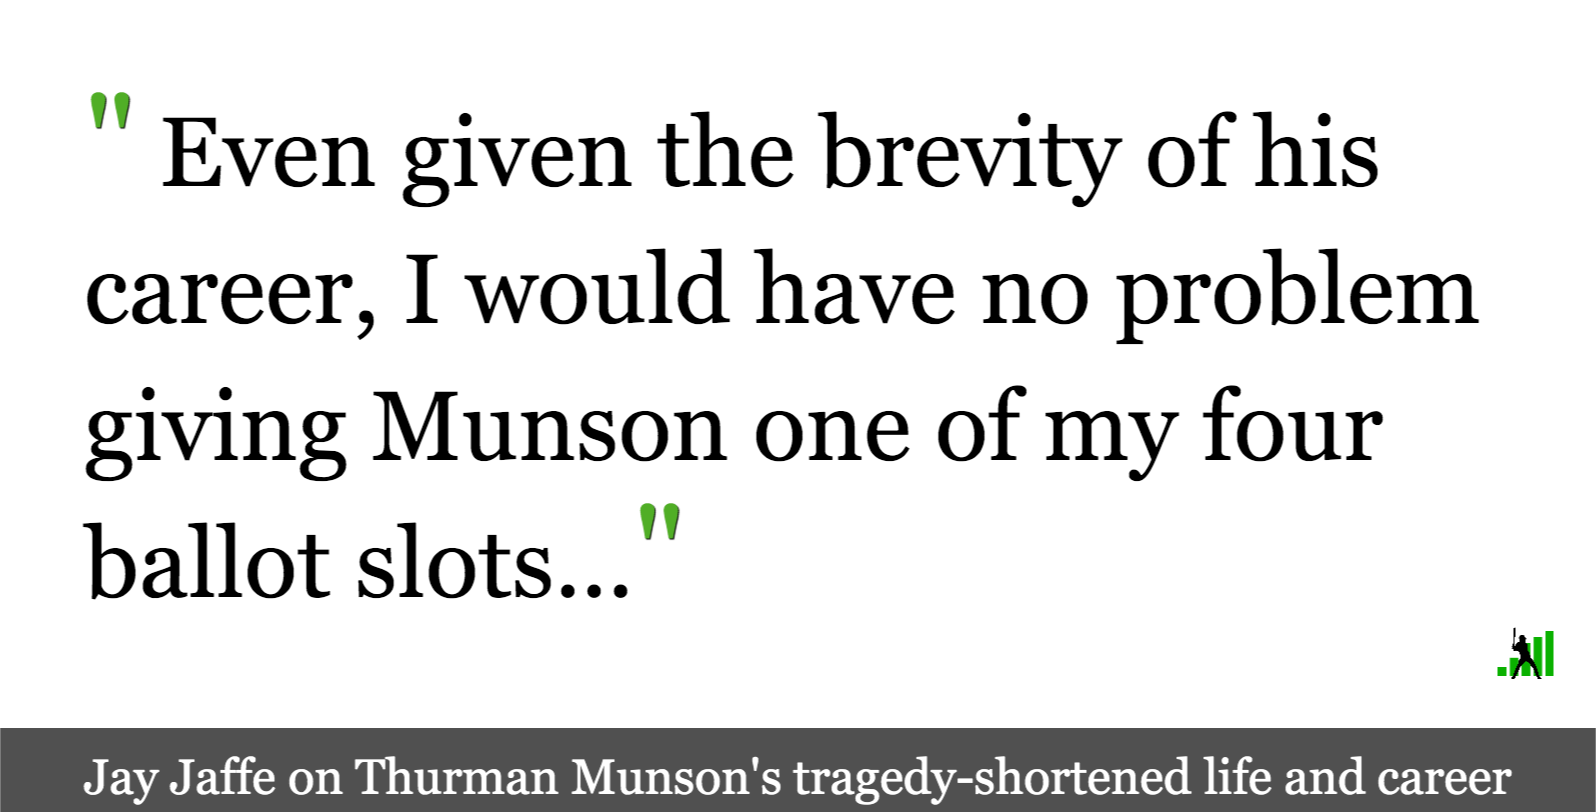 Despite Early Demise, Thurman Munson is Hallworthy - FanGraphs